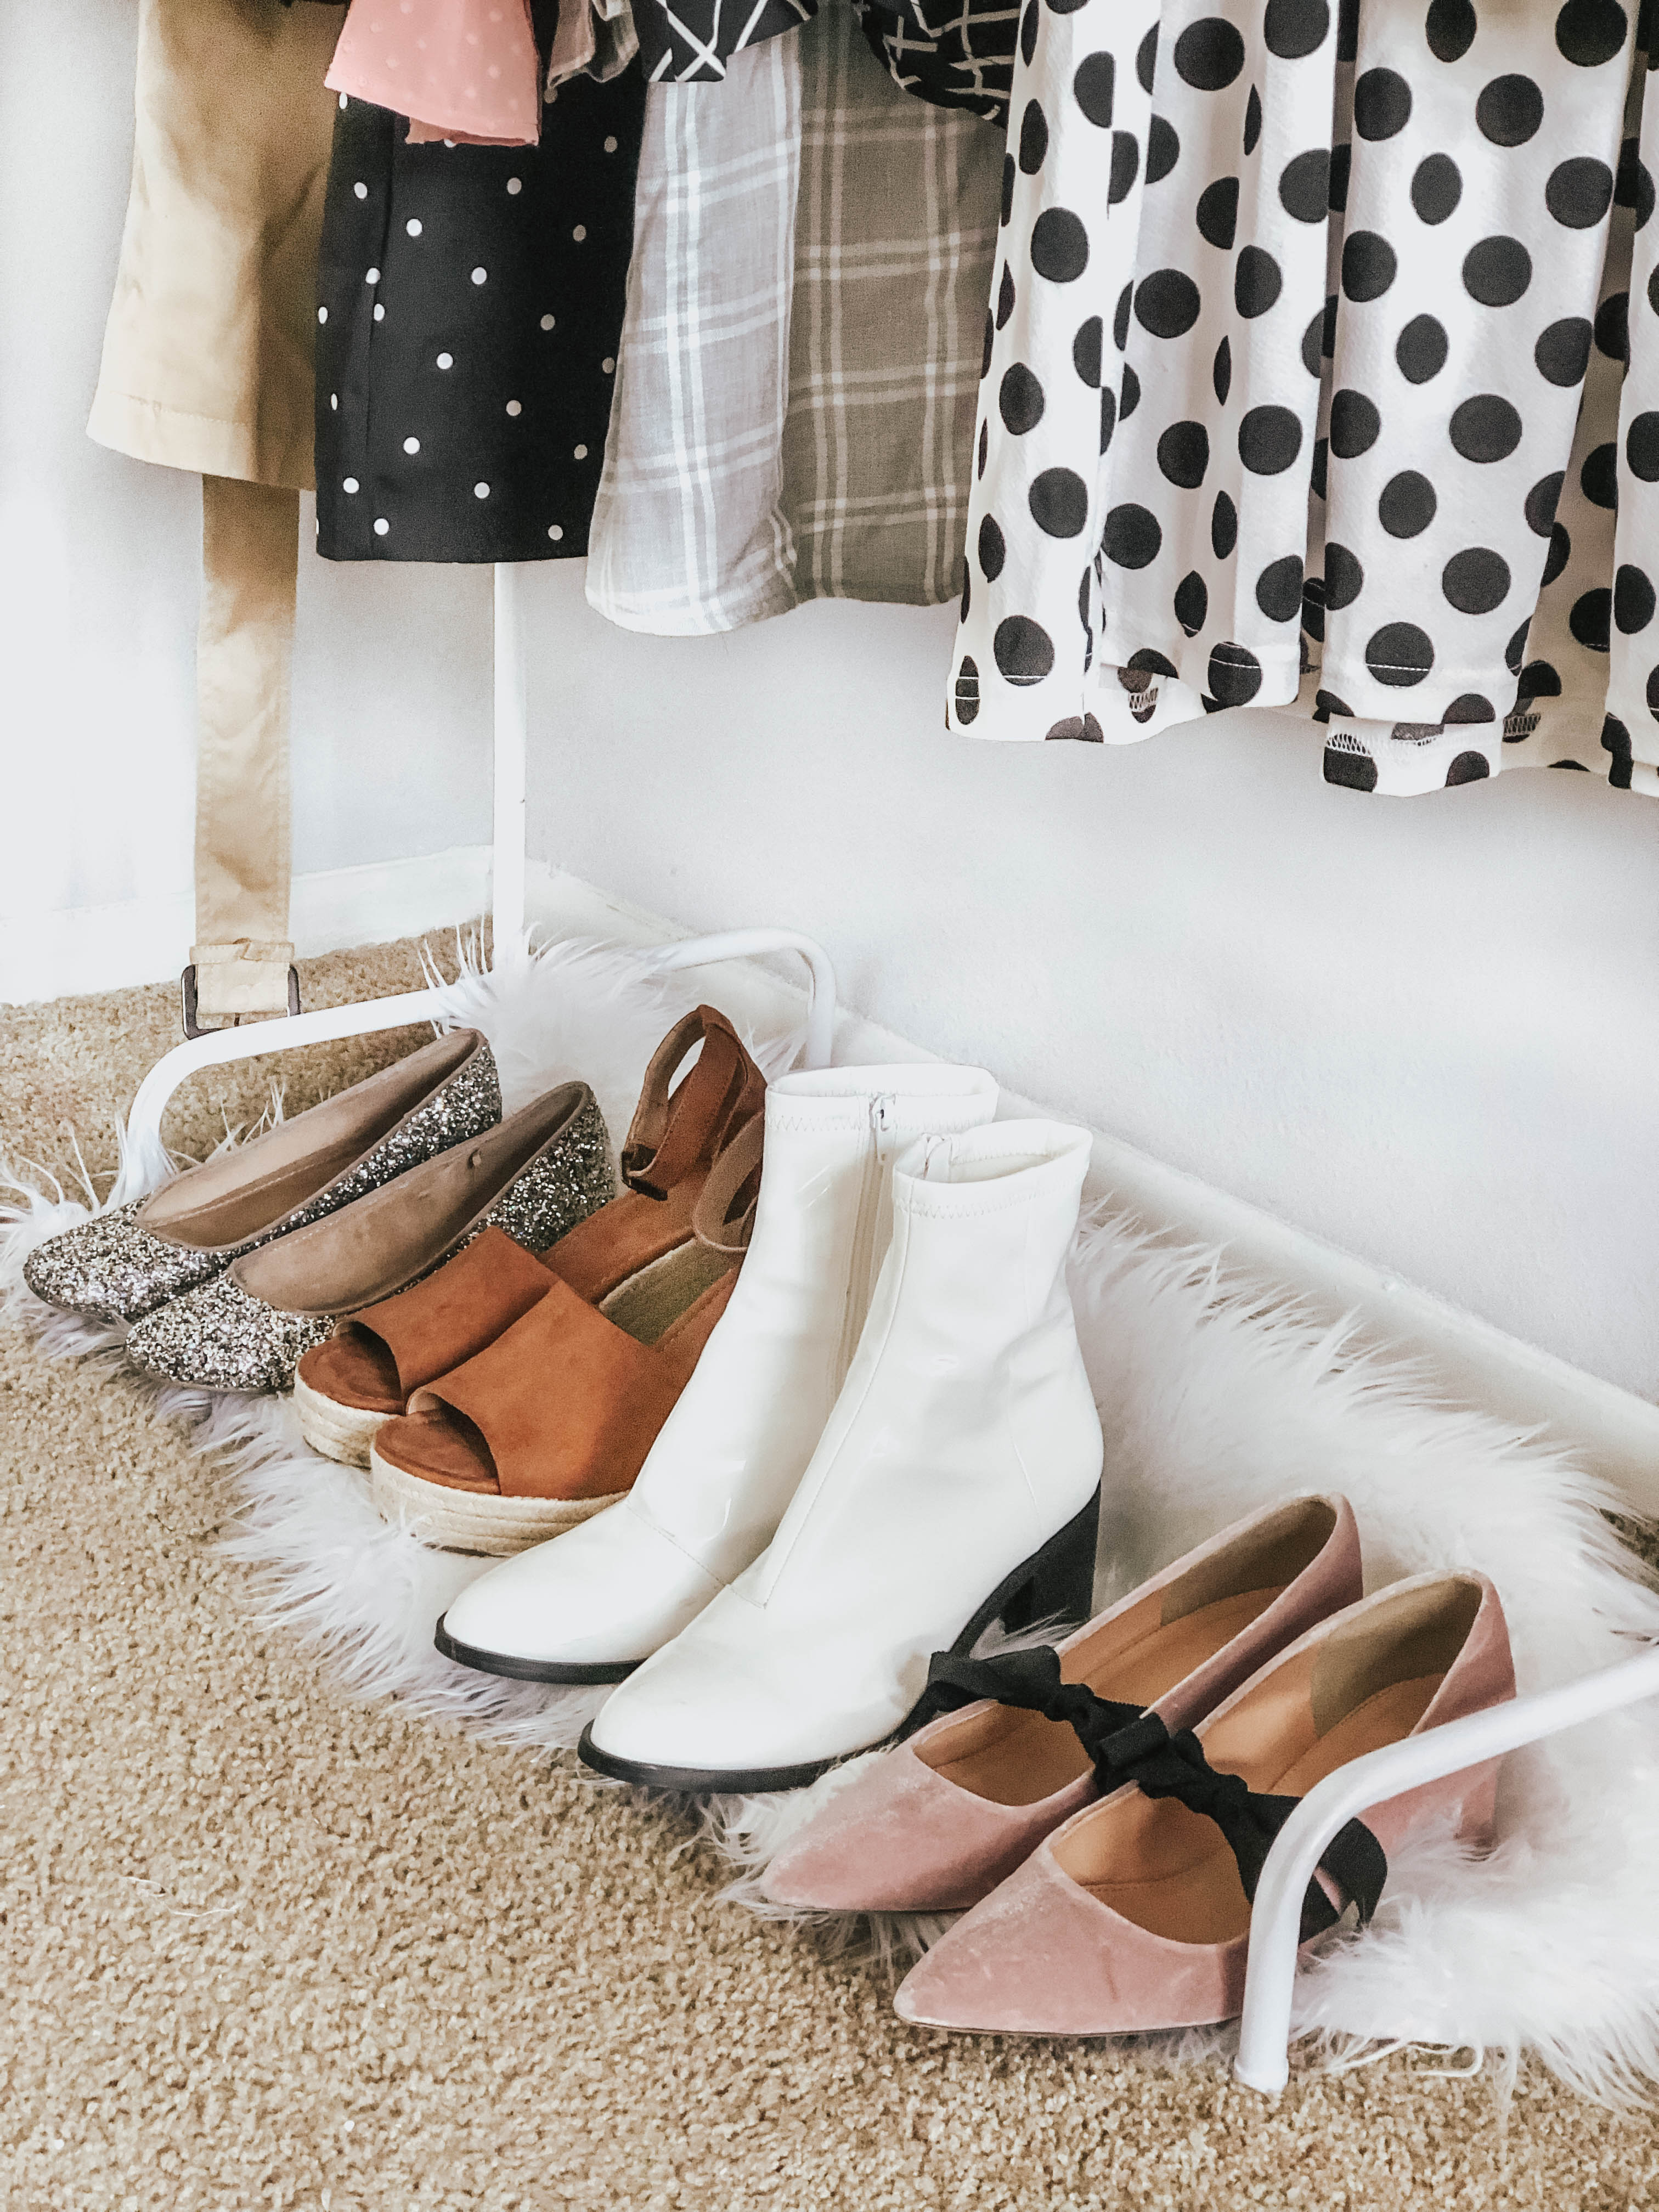 shoes-master-bedroom-tour.jpg